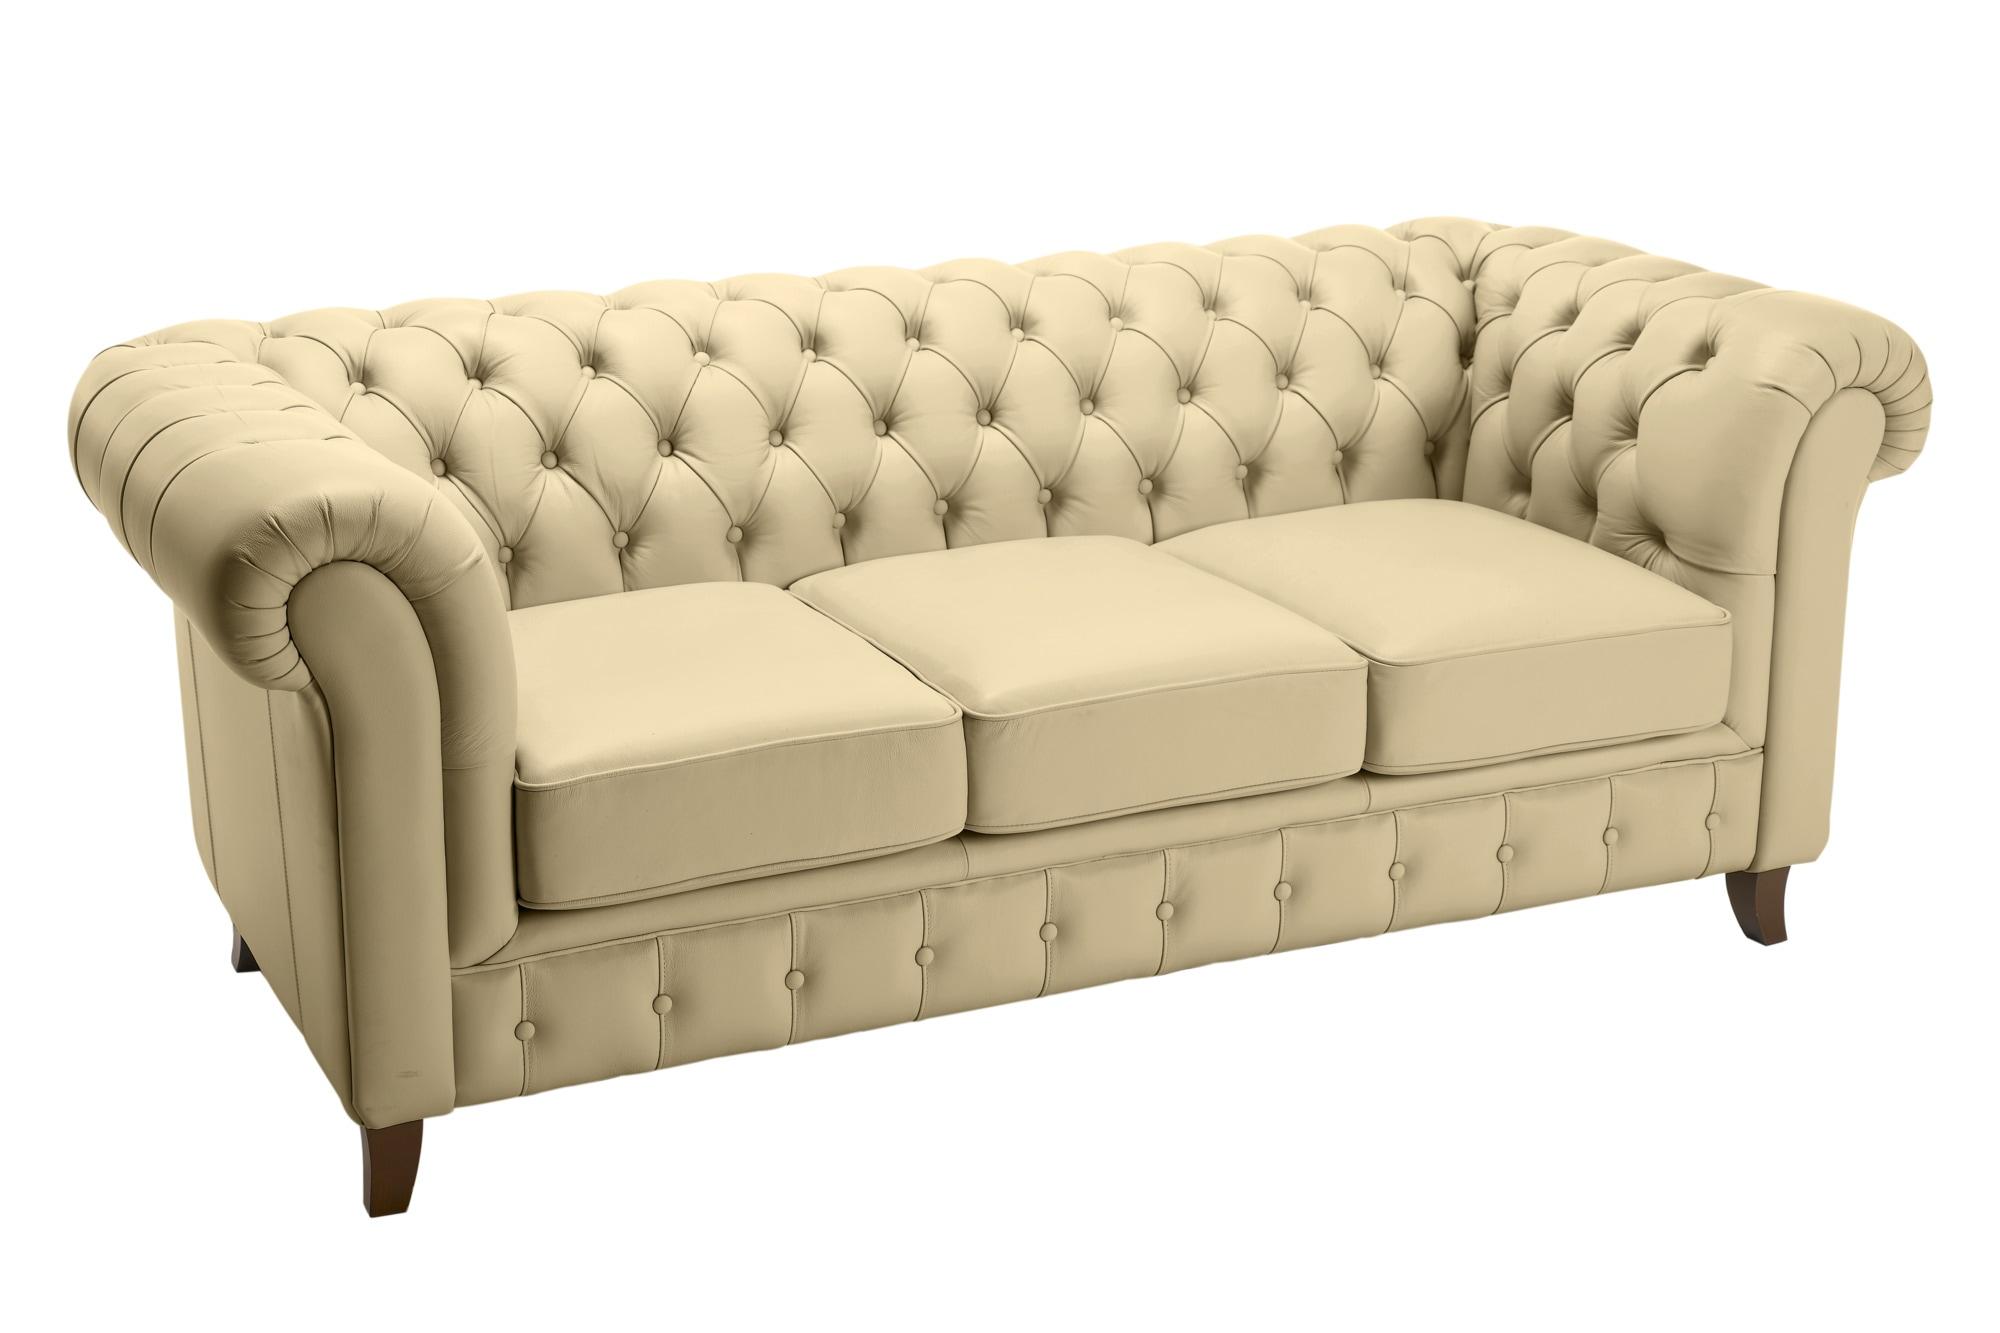 Sofa aus echtem Leder aus echtem Leder aus echtem Leder aus echtem Leder